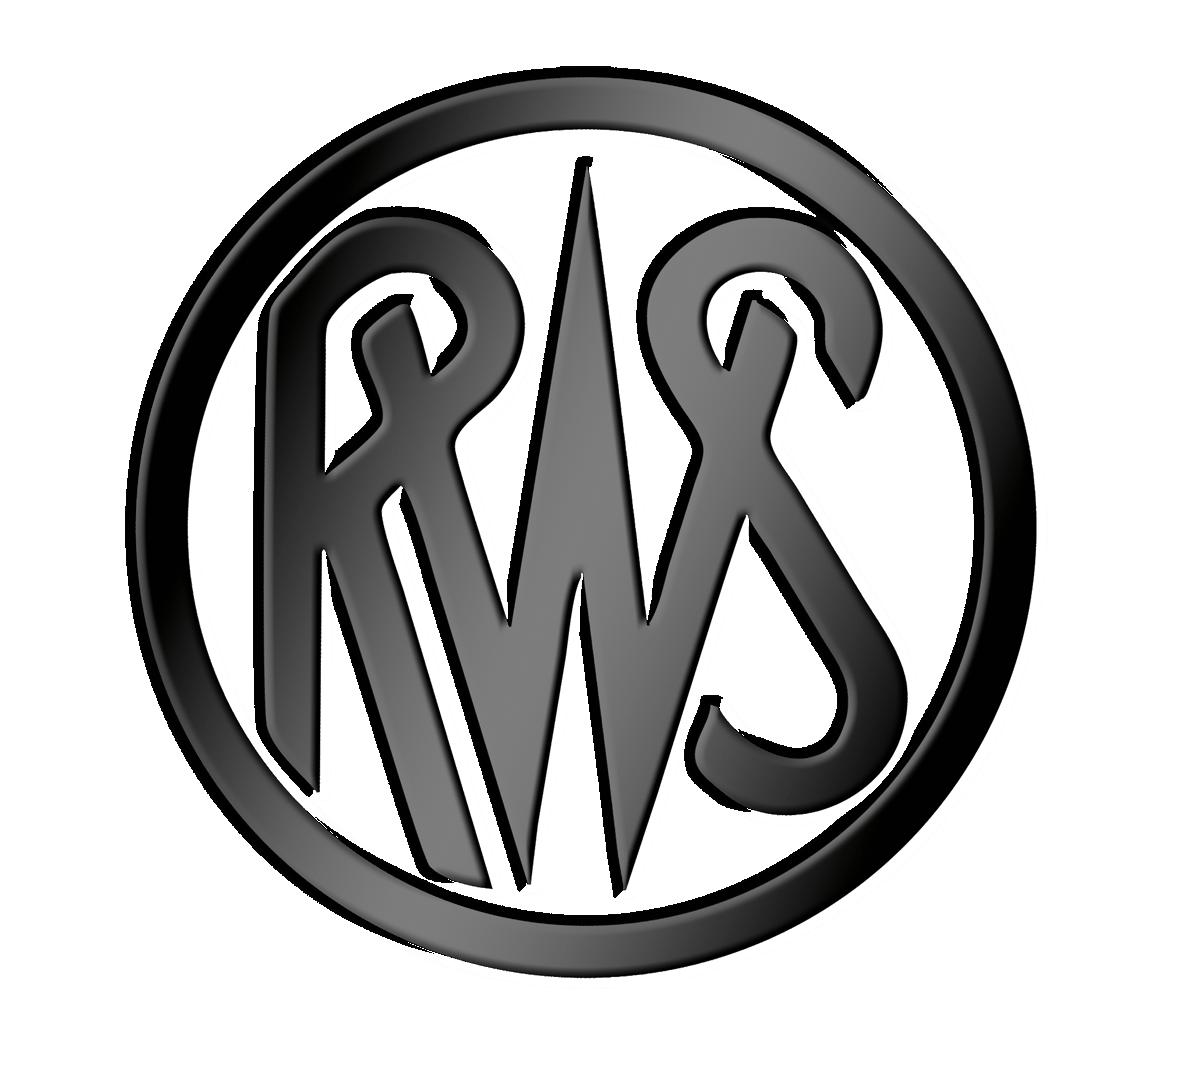 RWS ammo